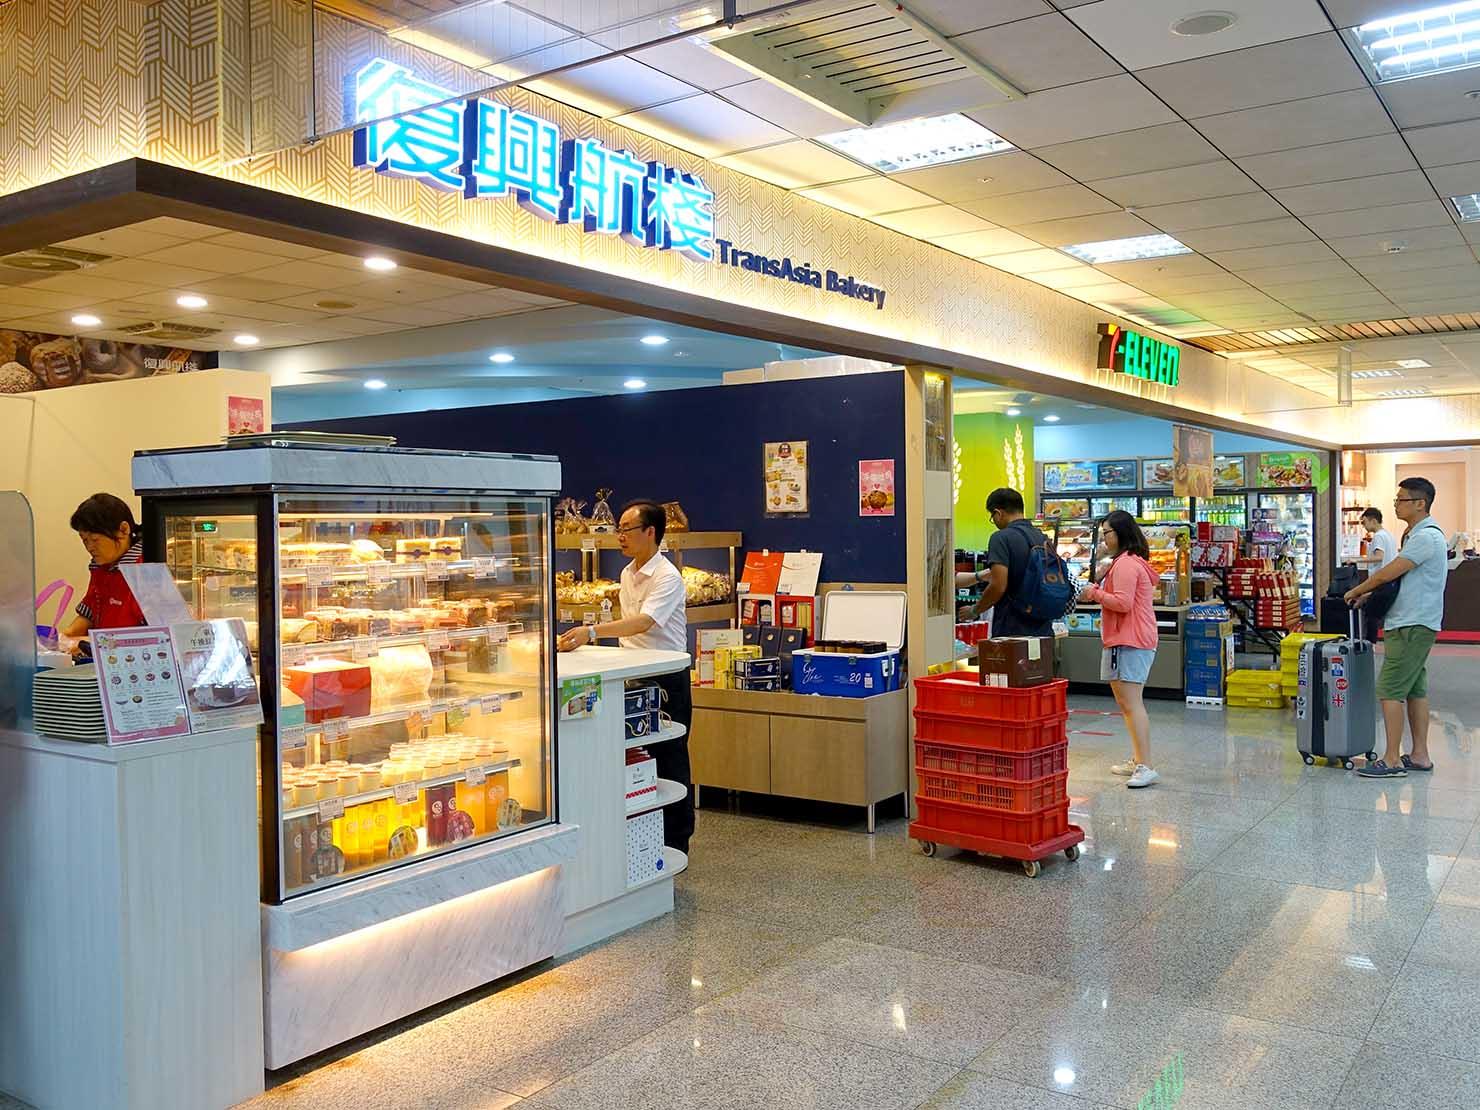 KKday外国人限定「花蓮・太魯閣(タロコ)日帰りツアー」台北・松山空港内のショップ